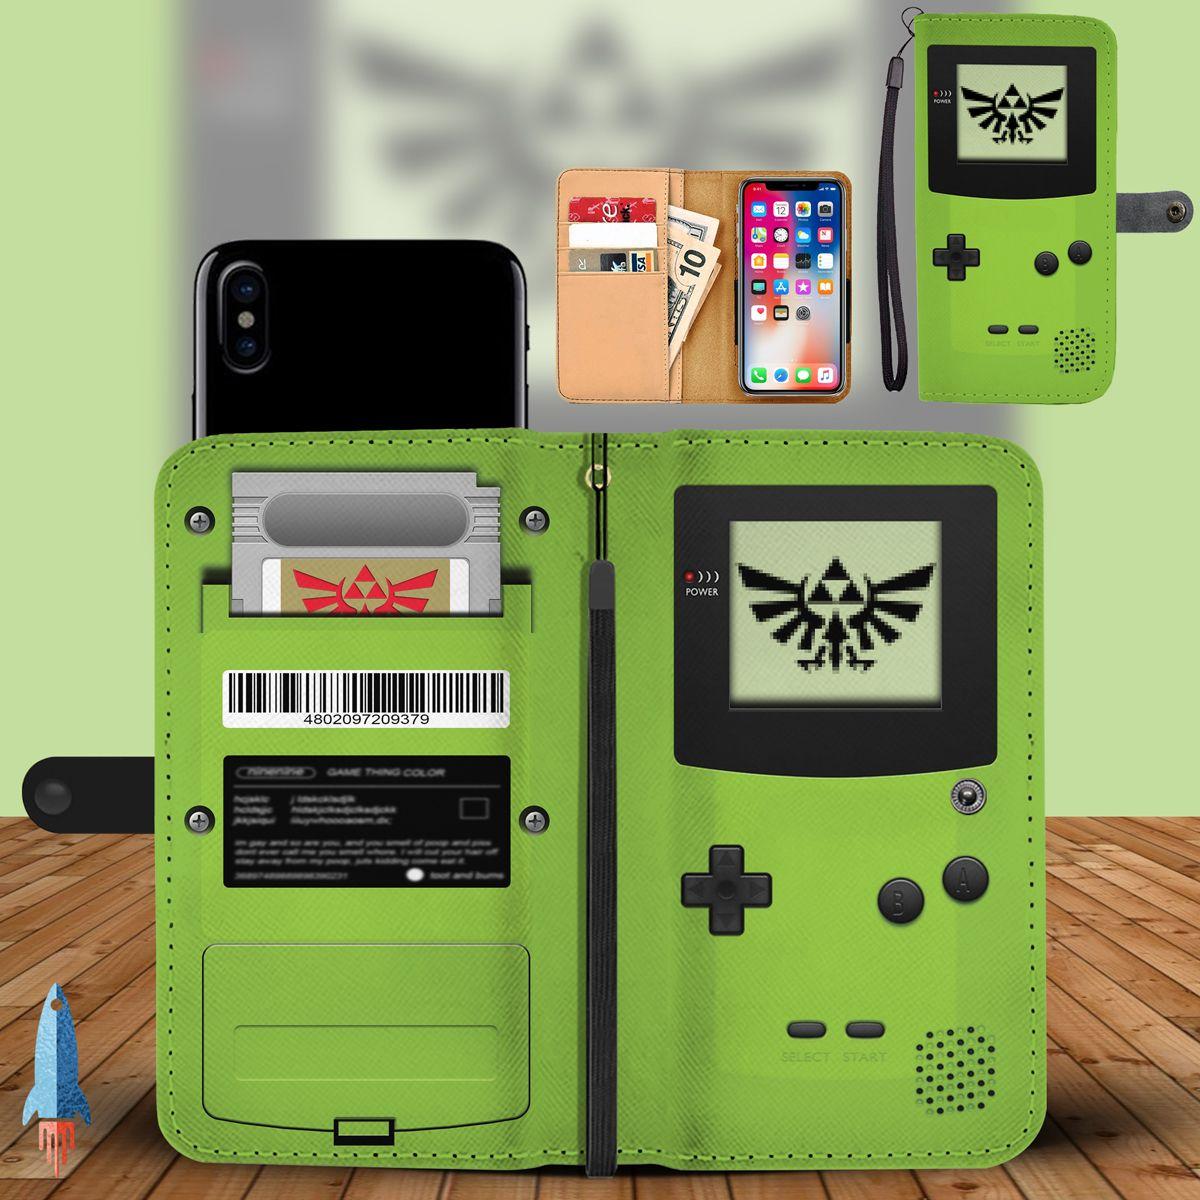 Definitely the coolest zelda phone wallet case ive seen